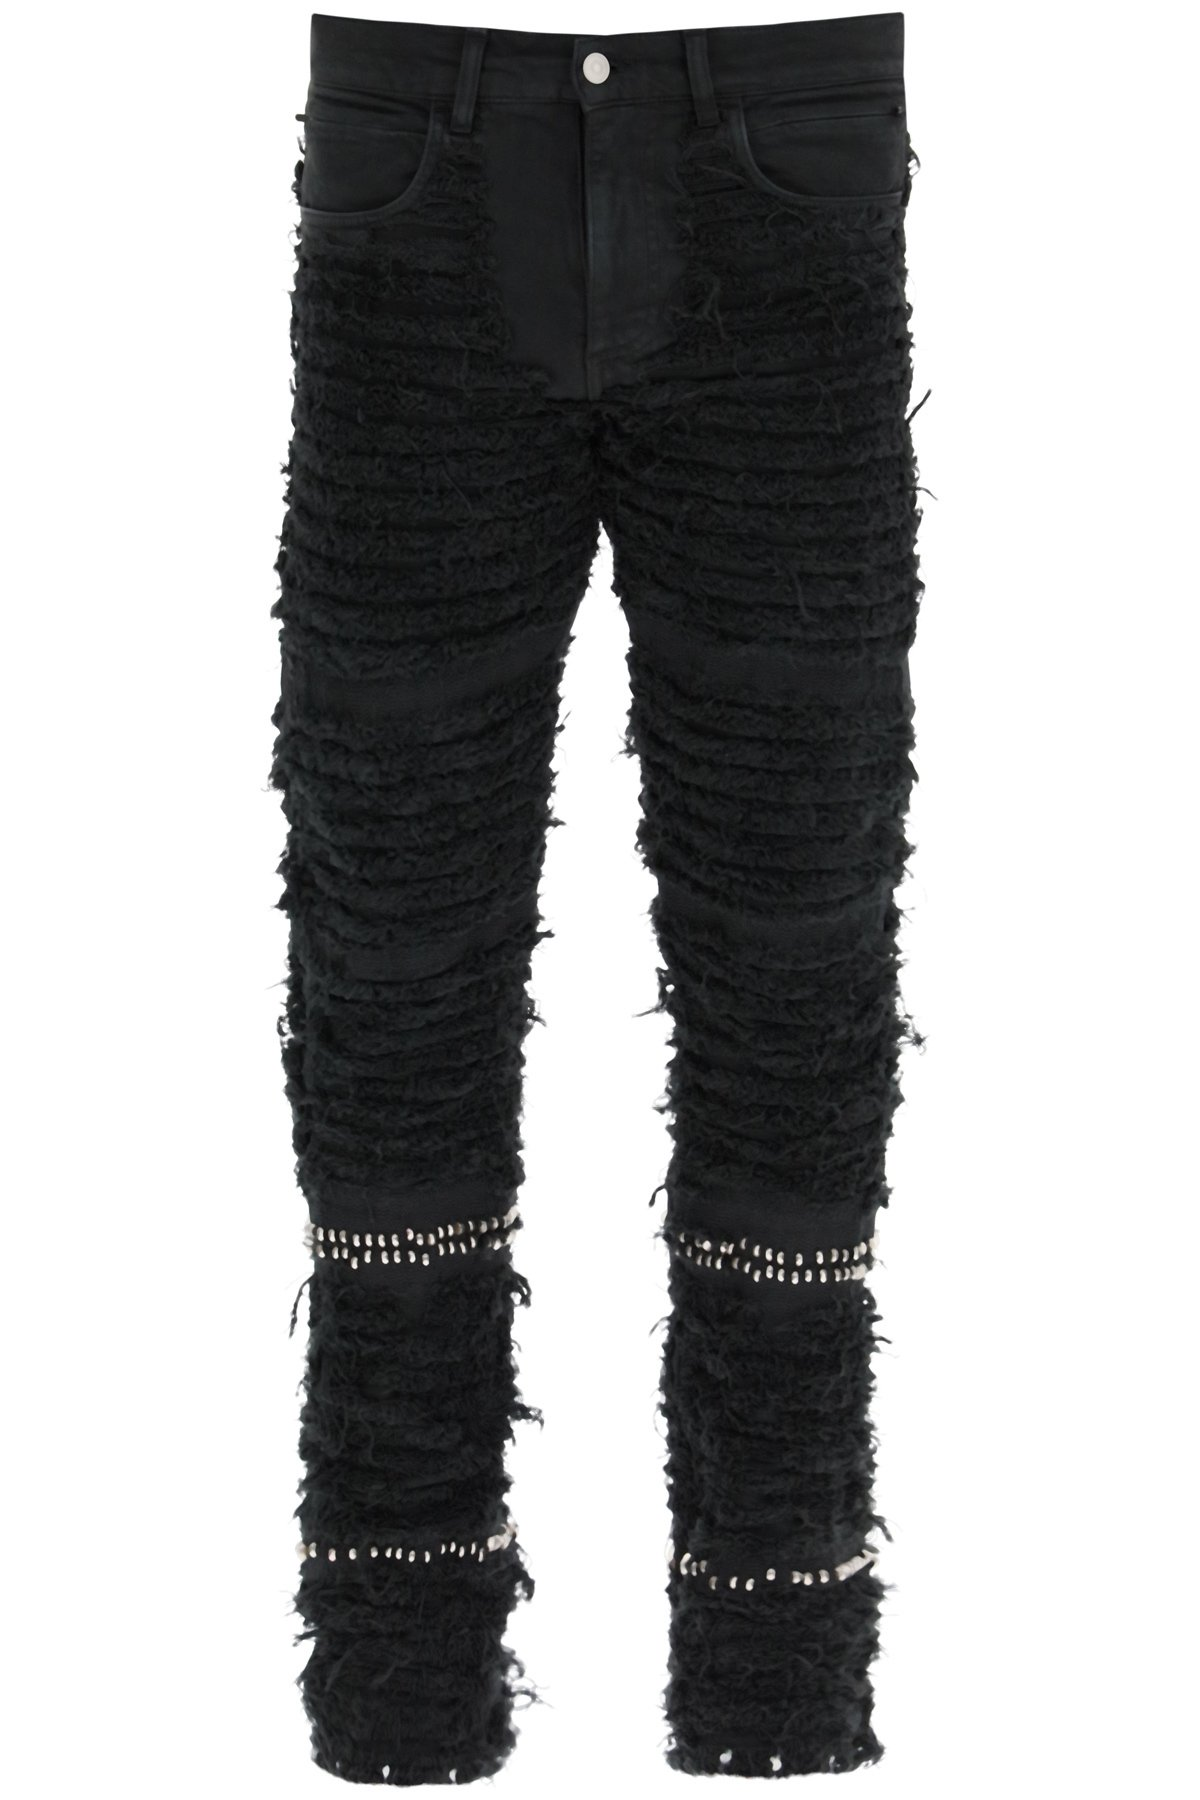 1017 alyx 9sm jeans studded blackmeans 6 pocket